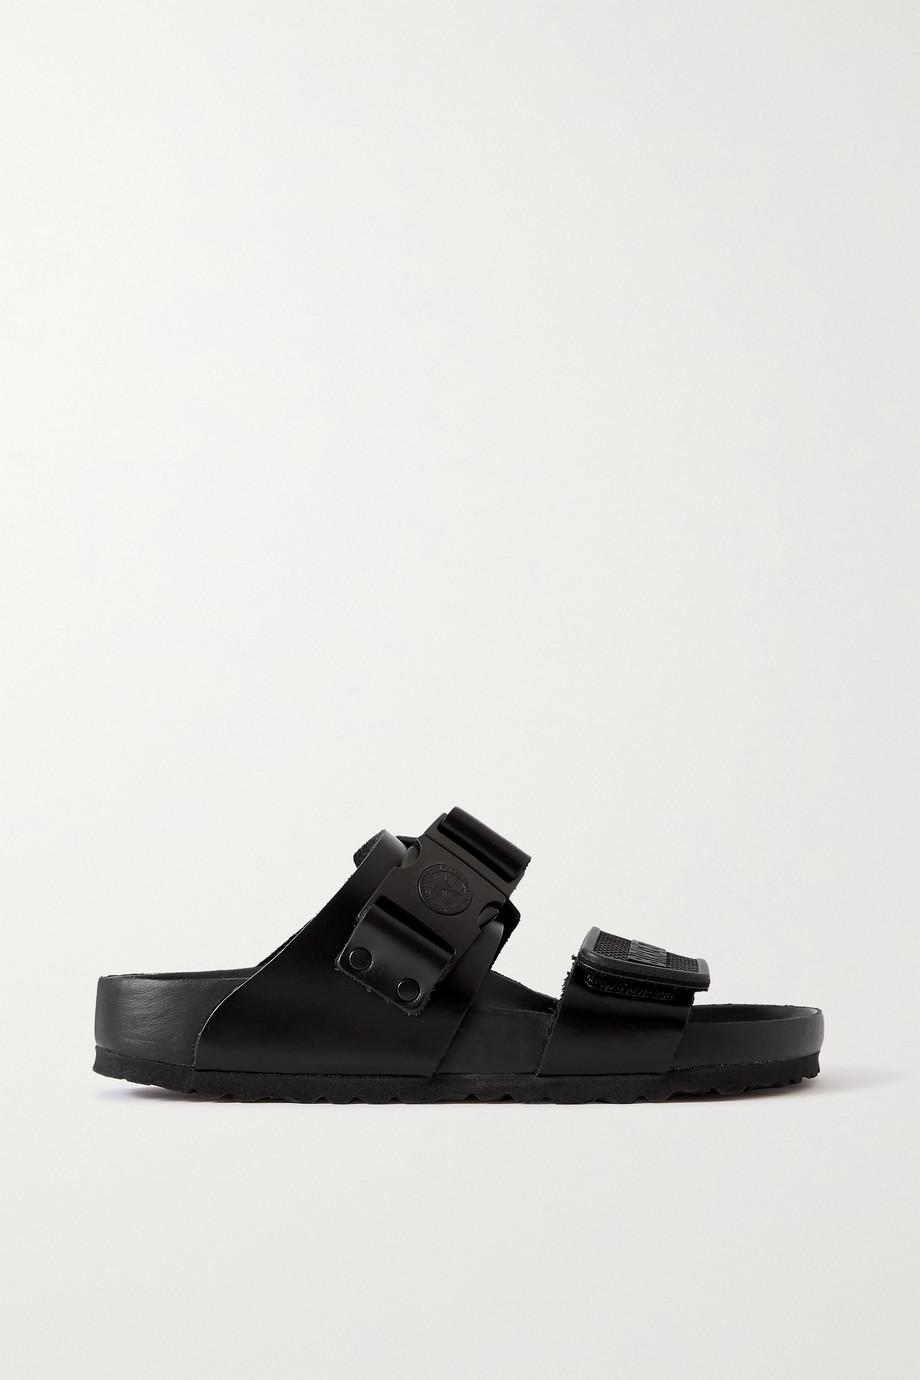 Rick Owens + Birkenstock Rotterdam leather sandals